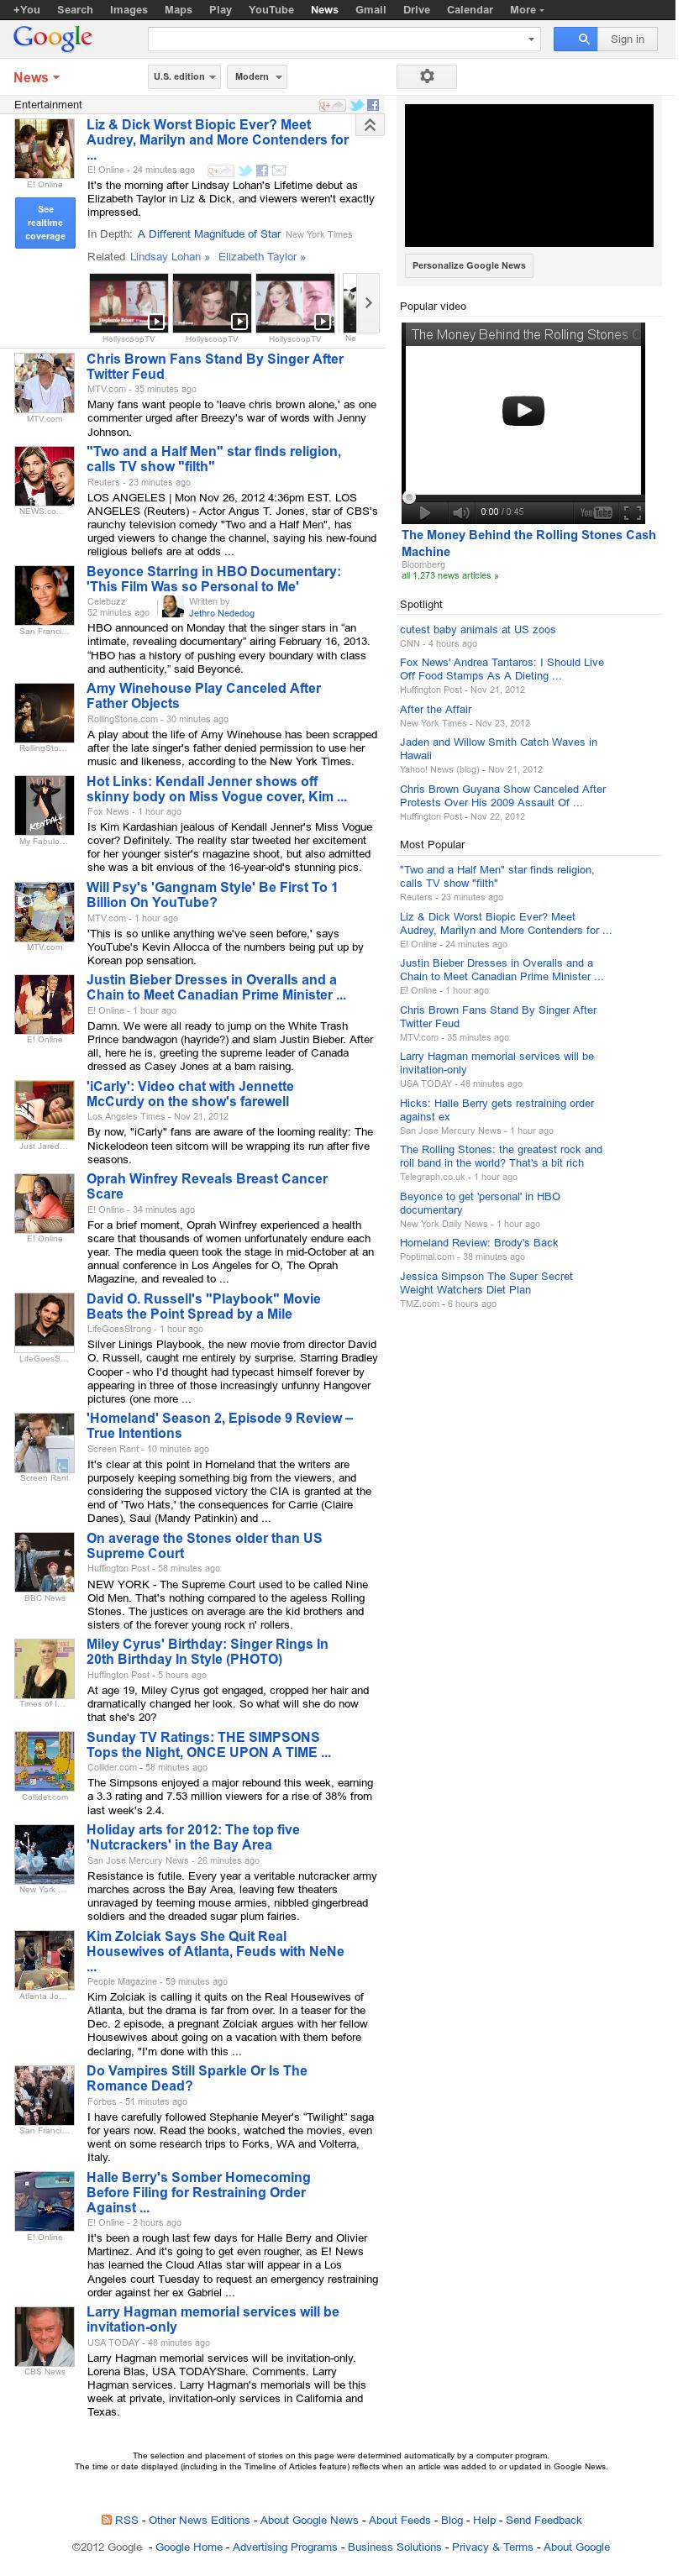 Google News: Entertainment at Monday Nov. 26, 2012, 10:11 p.m. UTC